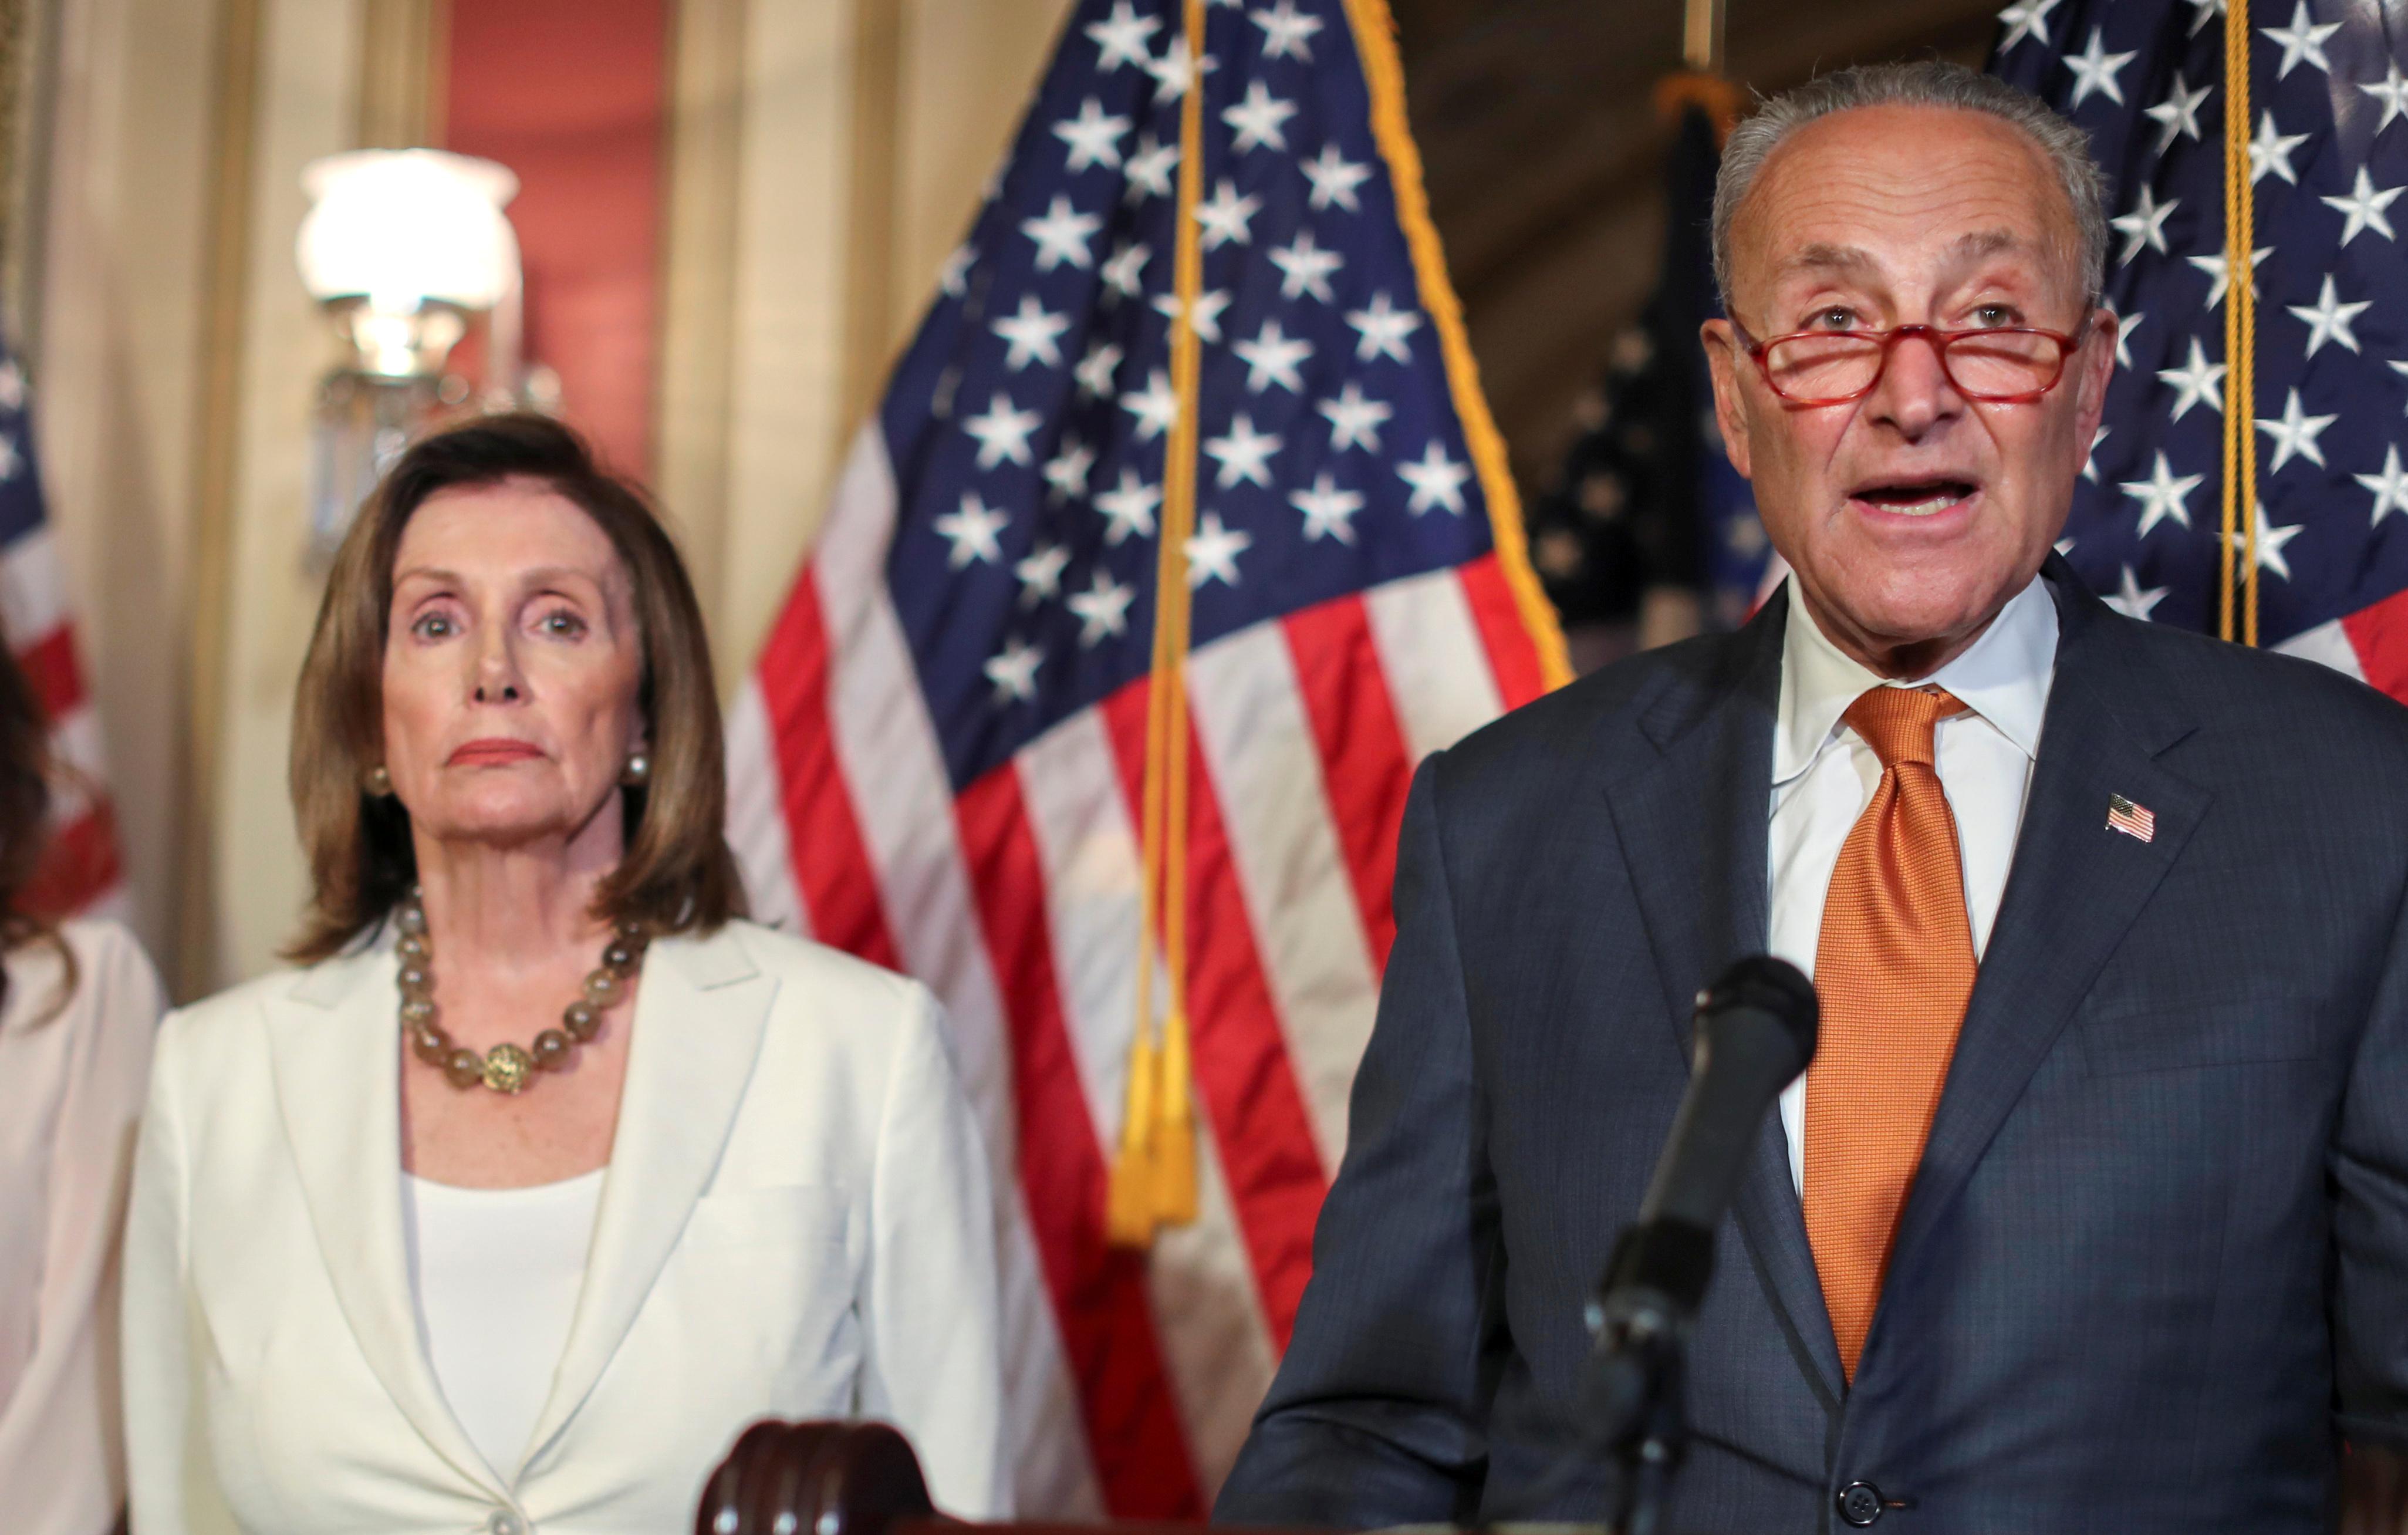 Top Democrats tell Trump gun bill must include universal background checks